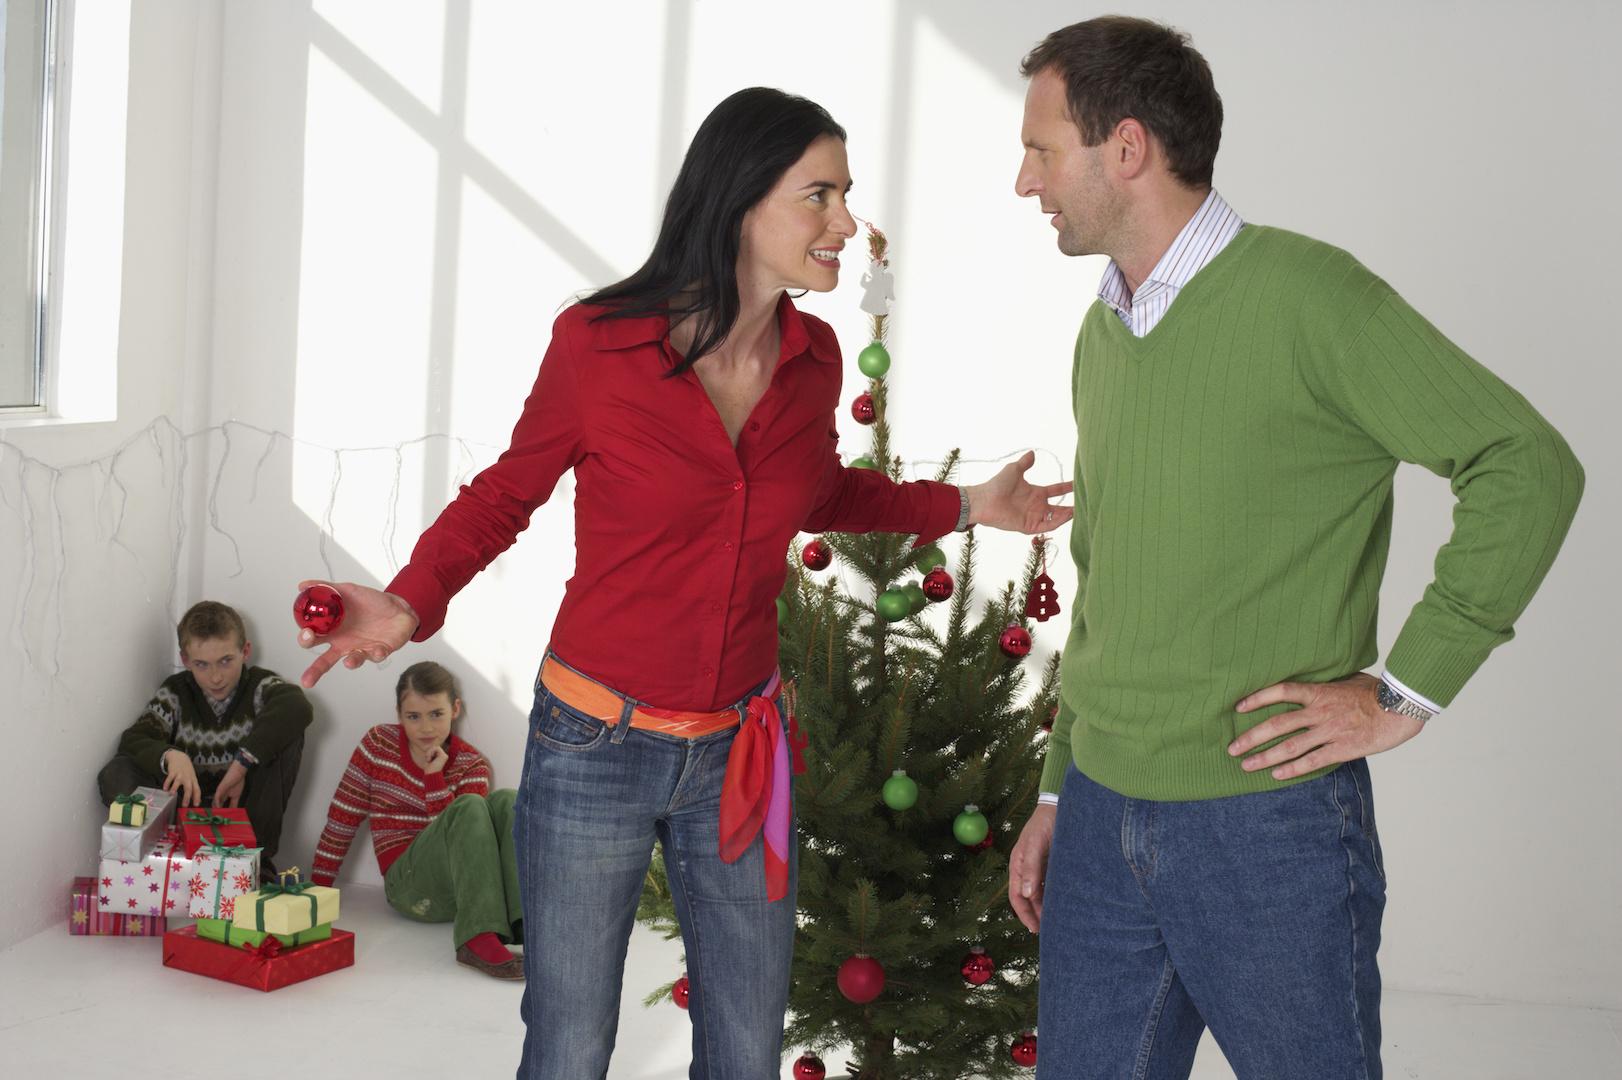 Christmas Season - AdobeStock_140143907